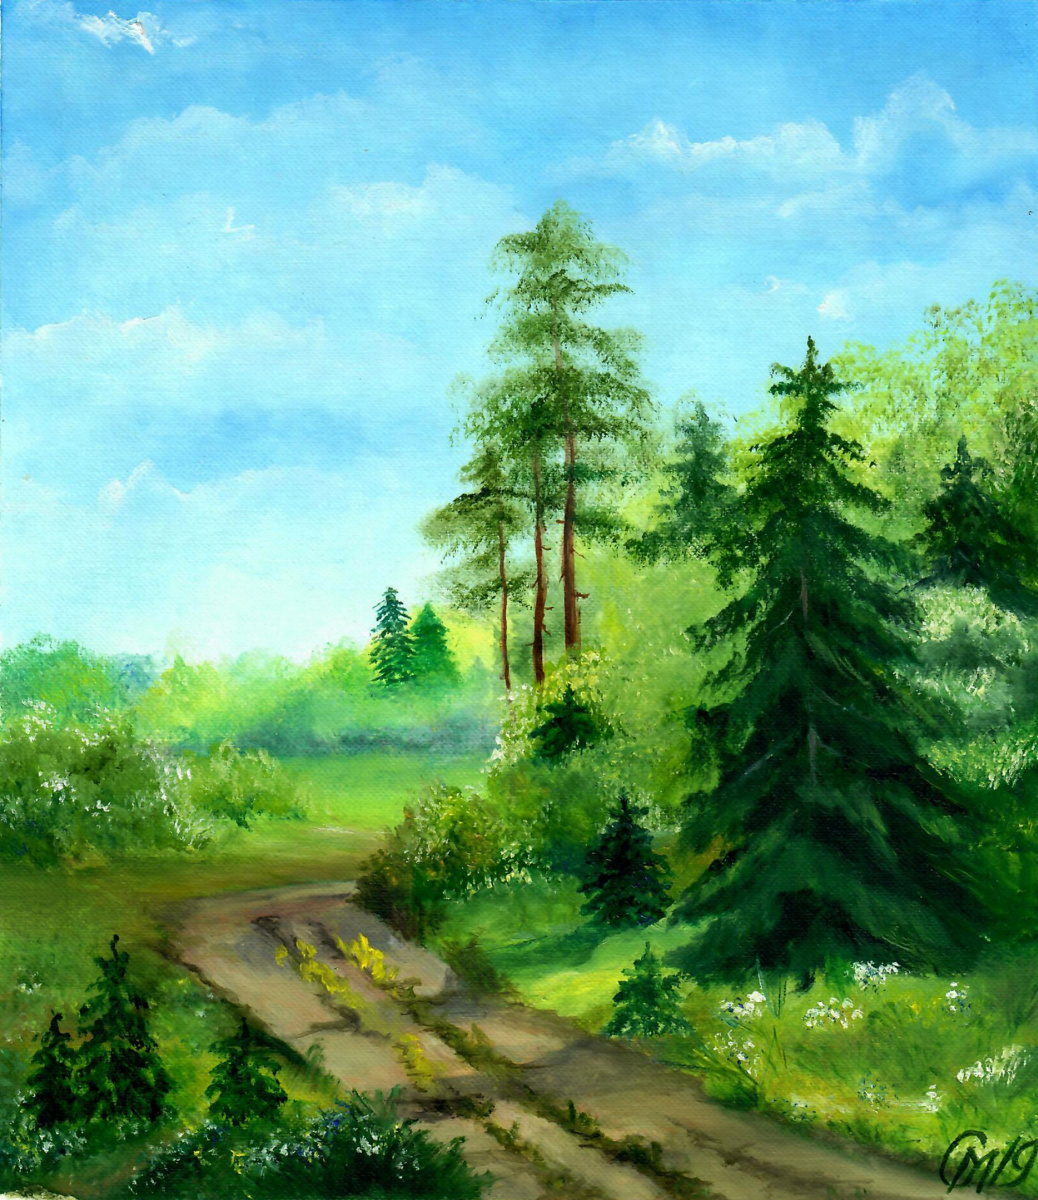 Мария Евгеньевна Сироткина. Into the forest for mushrooms